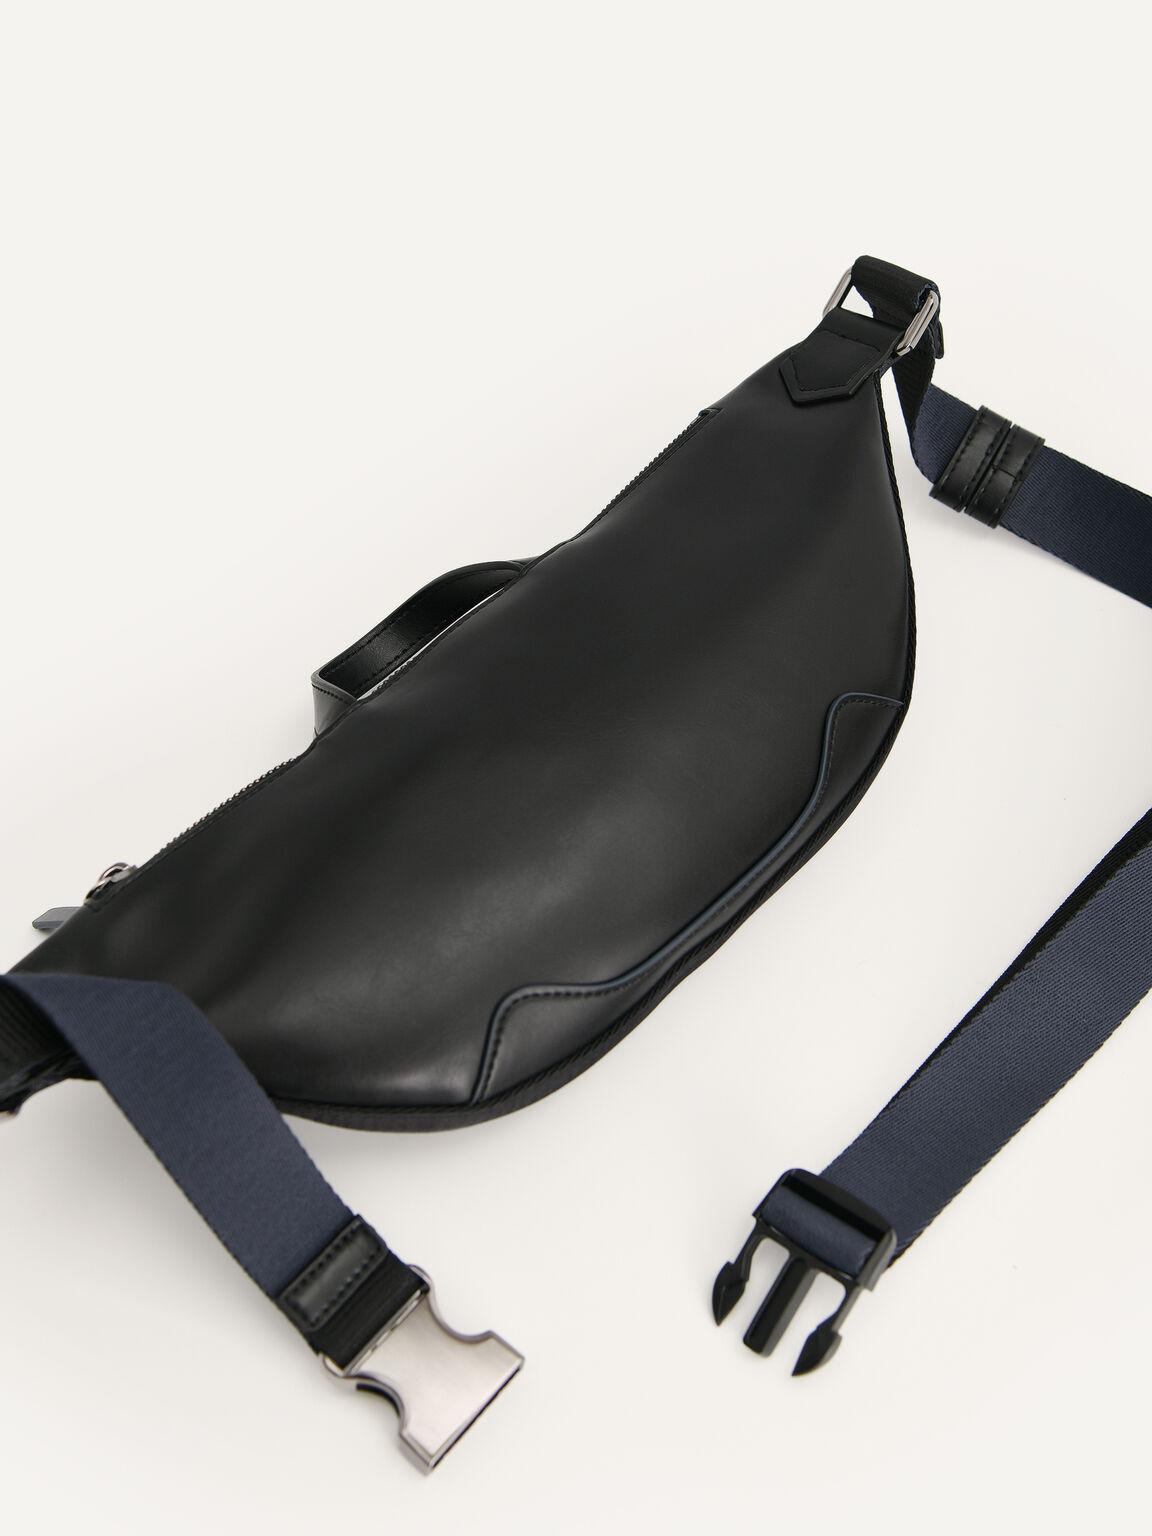 rePEDRO有機帆布腰包, 黑色, hi-res